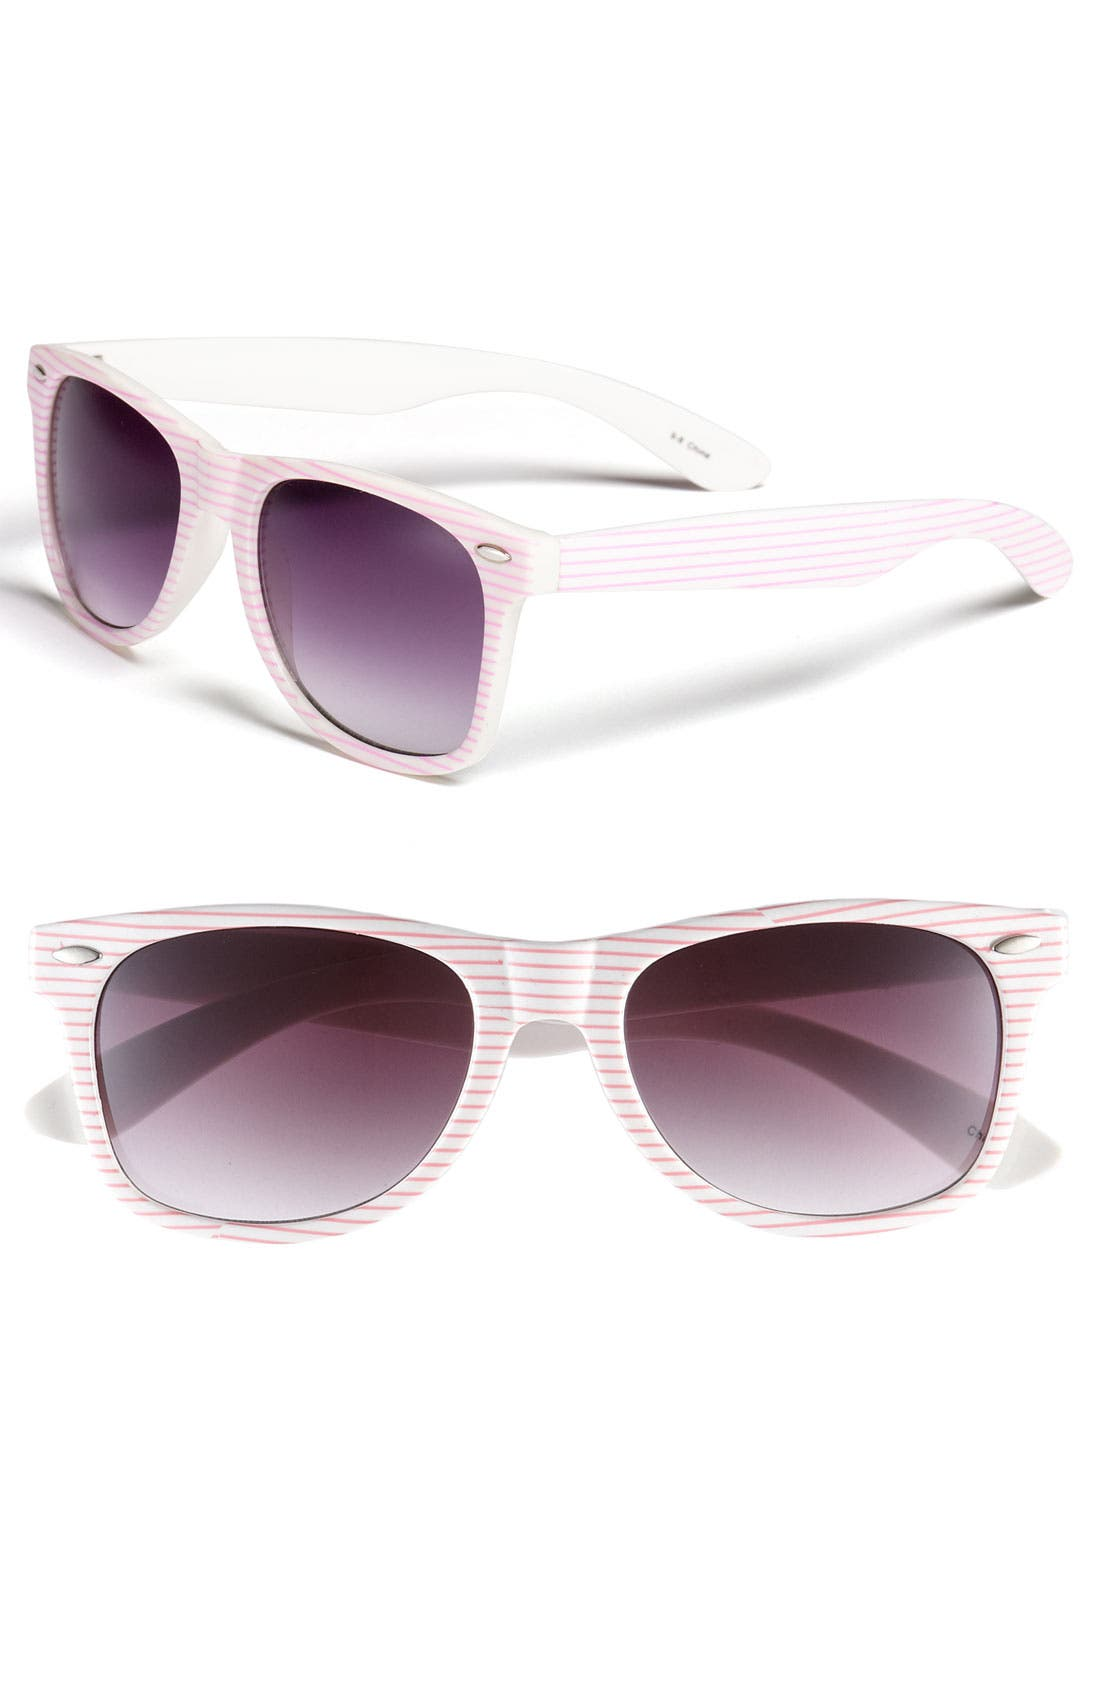 Main Image - Icon Eyewear Striped Retro Sunglasses